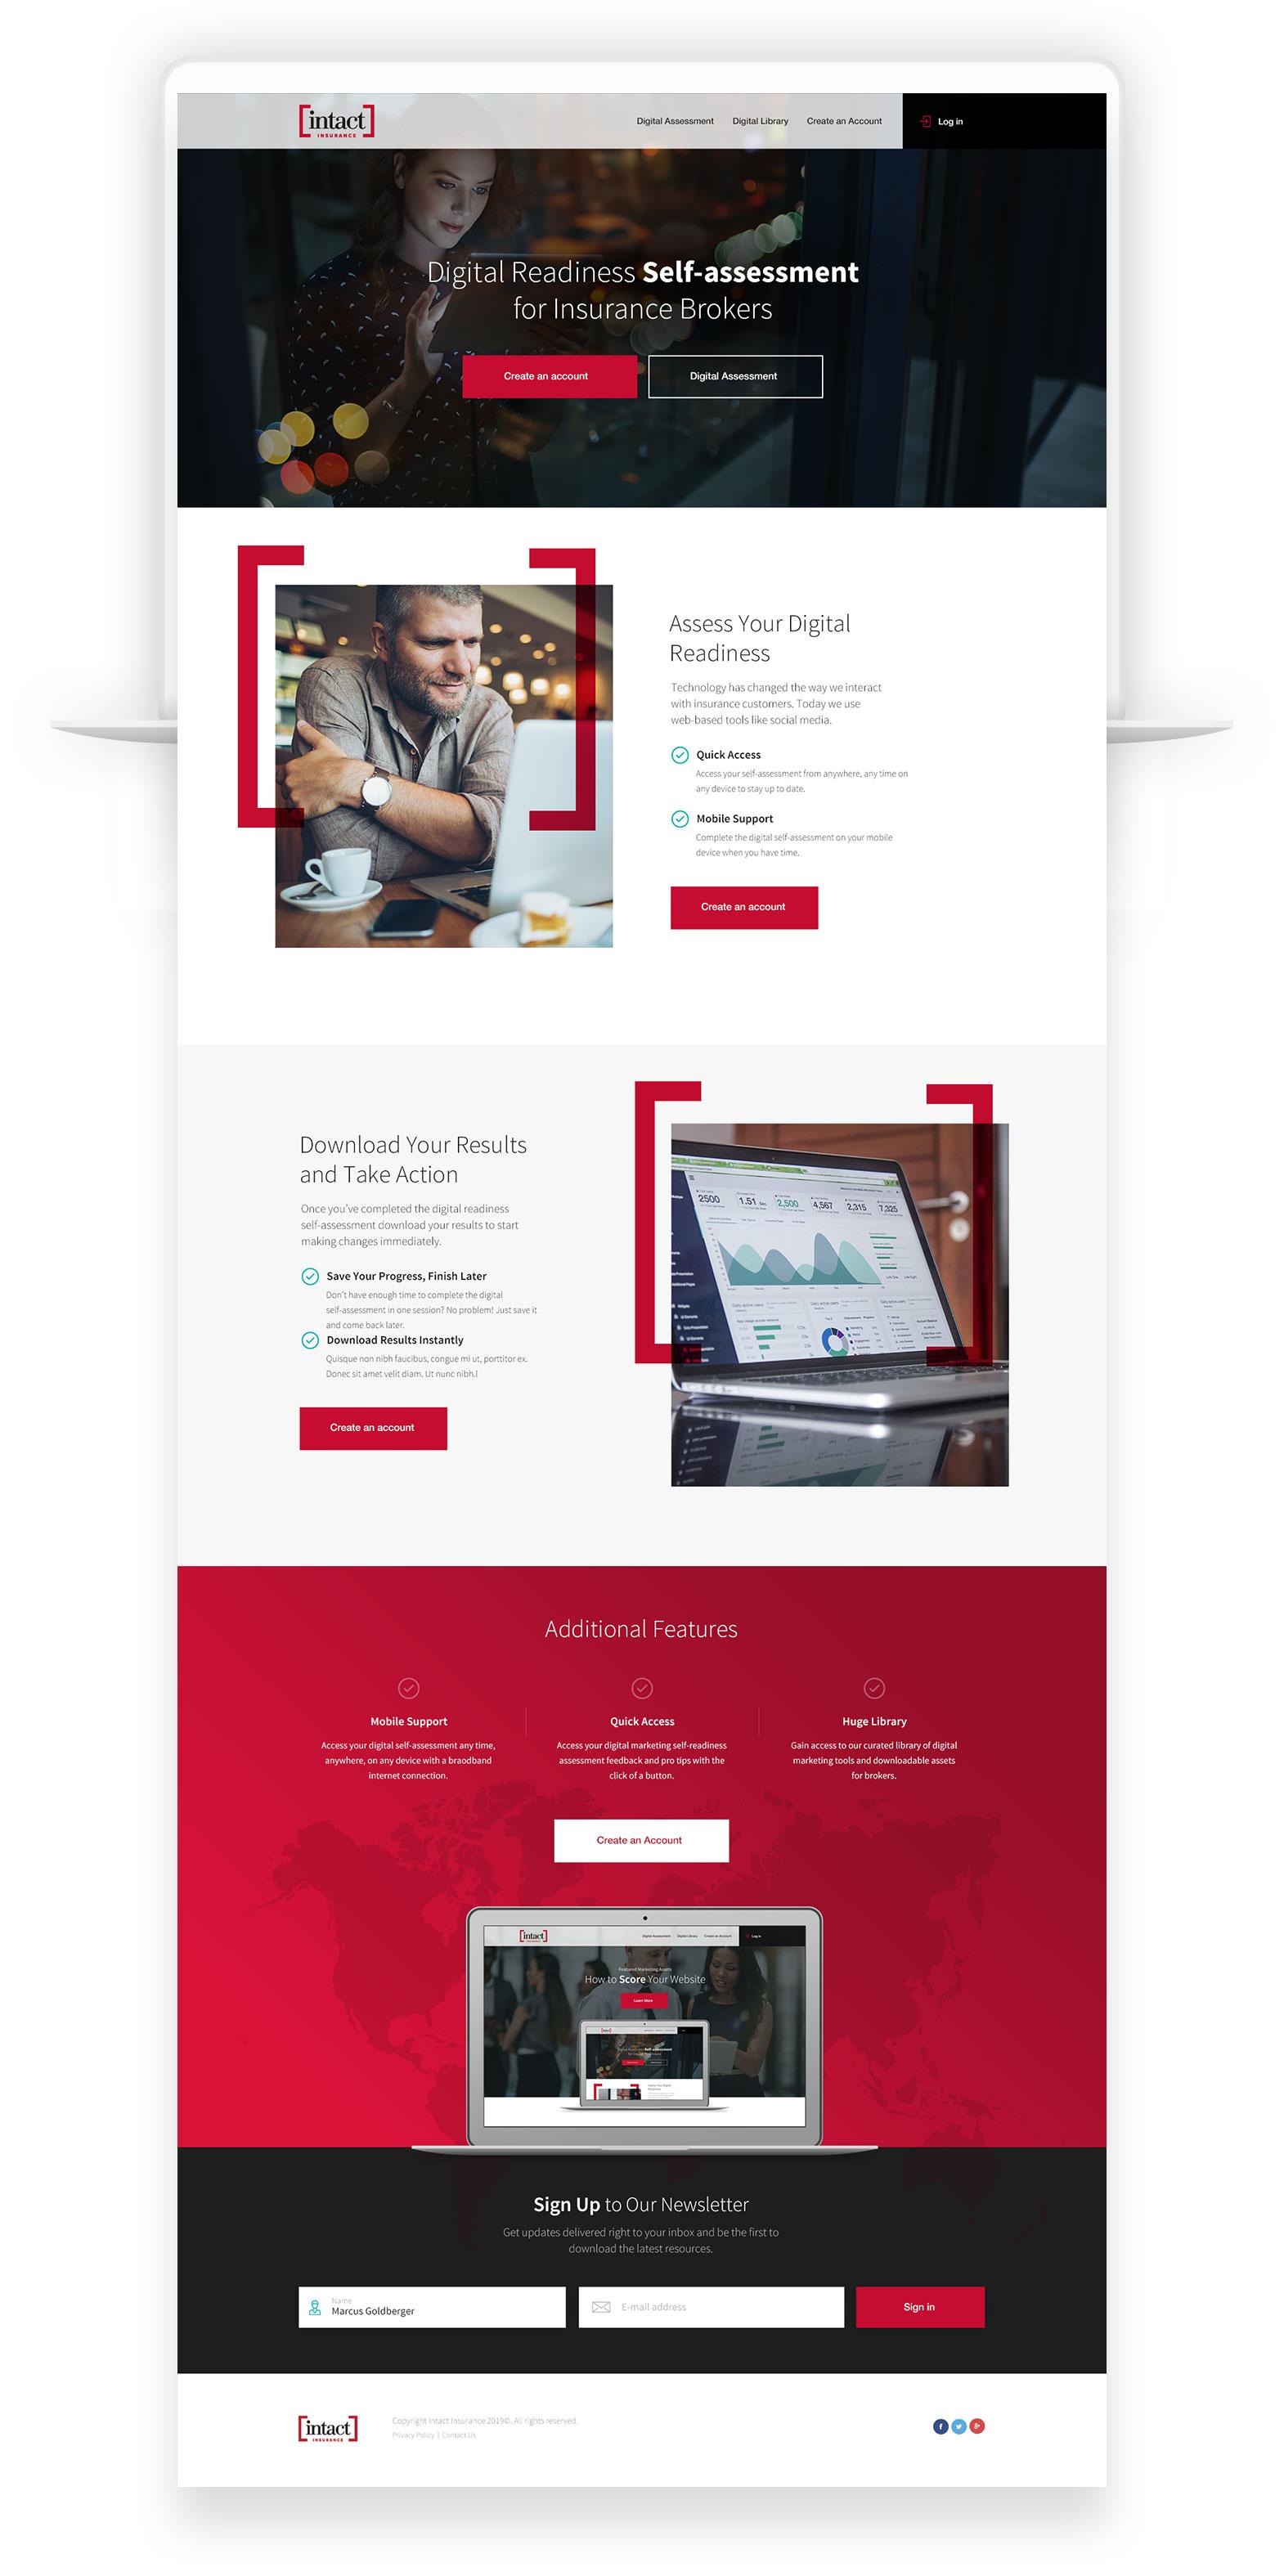 Web Design for Insurance Company – Intact Digital Self-Assessment